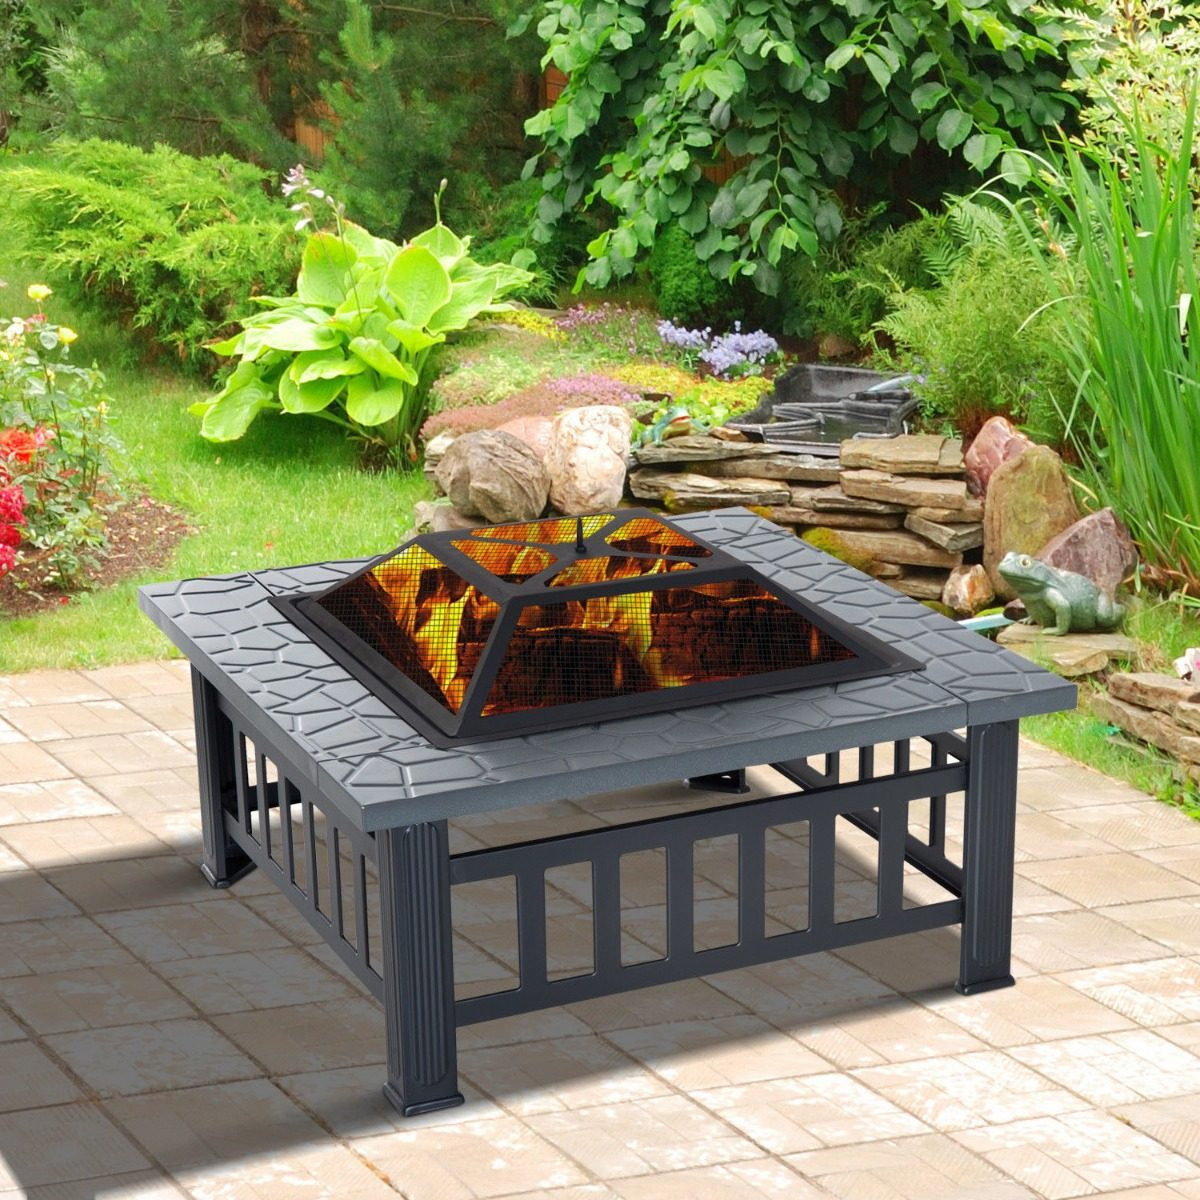 Fogata Exterior Fire Pit Patio Lena Jardin Chimenea 347500 En - Chimenea-jardin